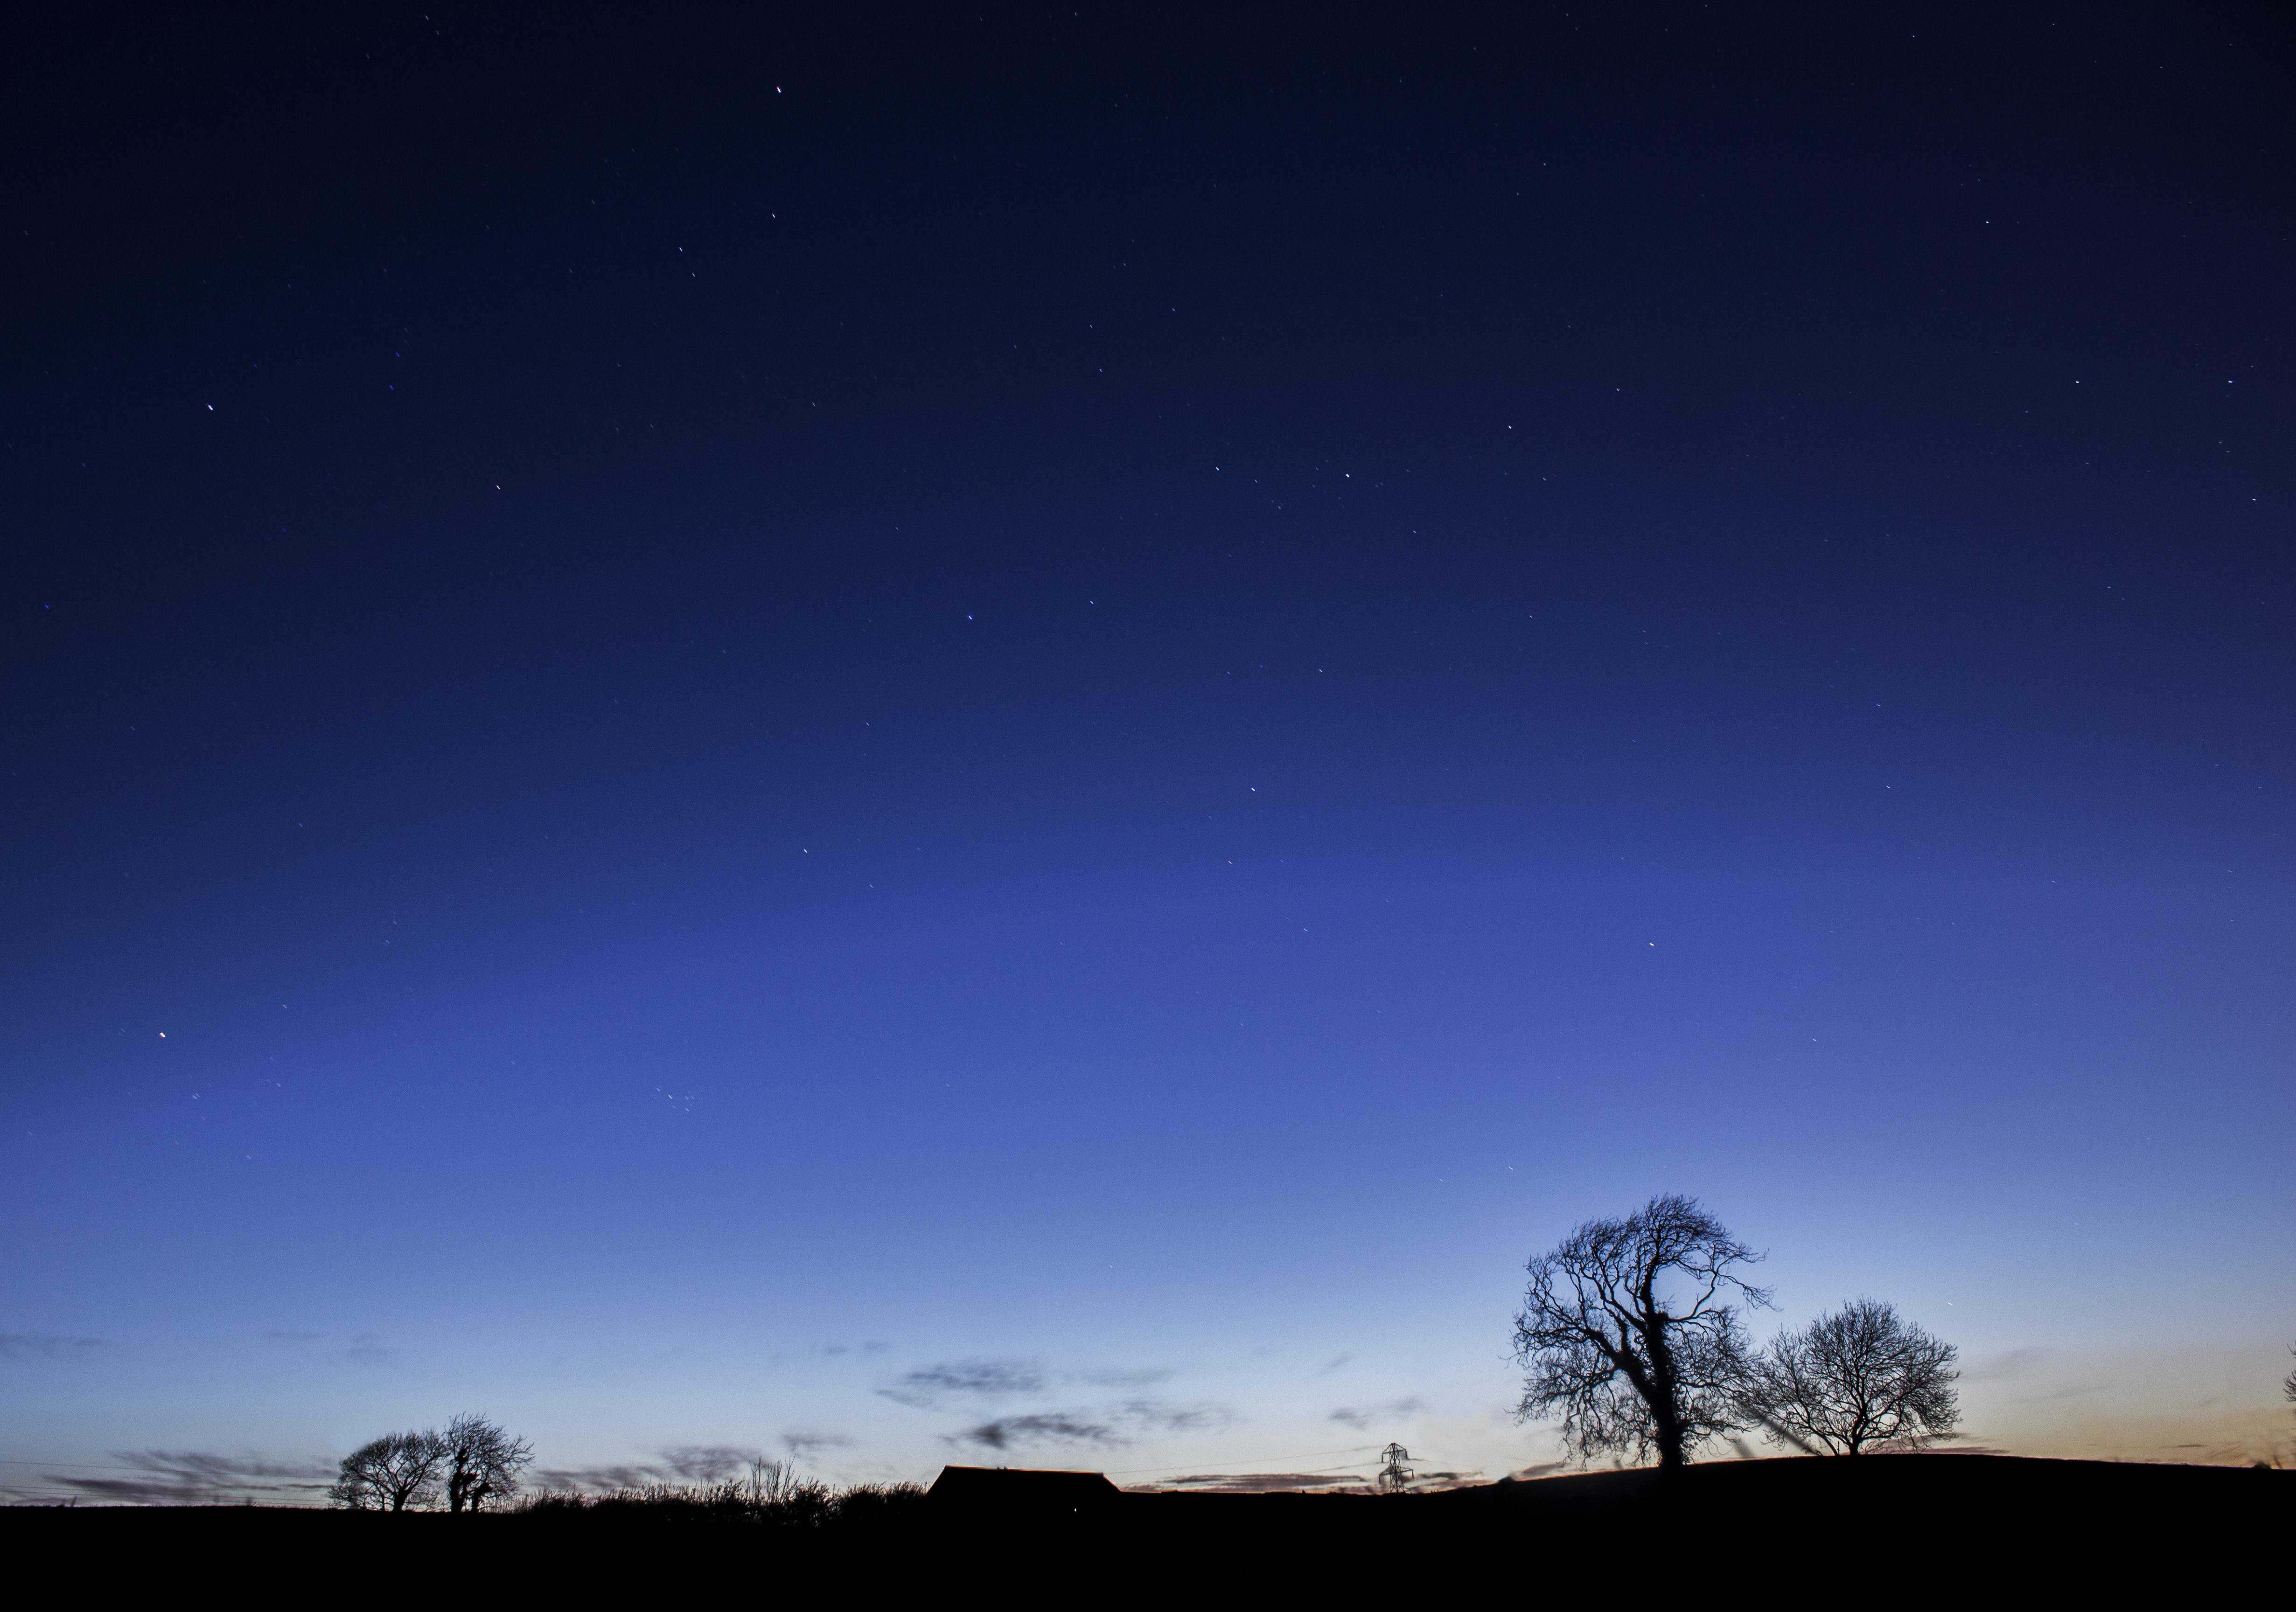 Nature Horizon Light Cloud Sky Night Star Dawn Atmosphere Dark Dusk Evening Darkness Blue